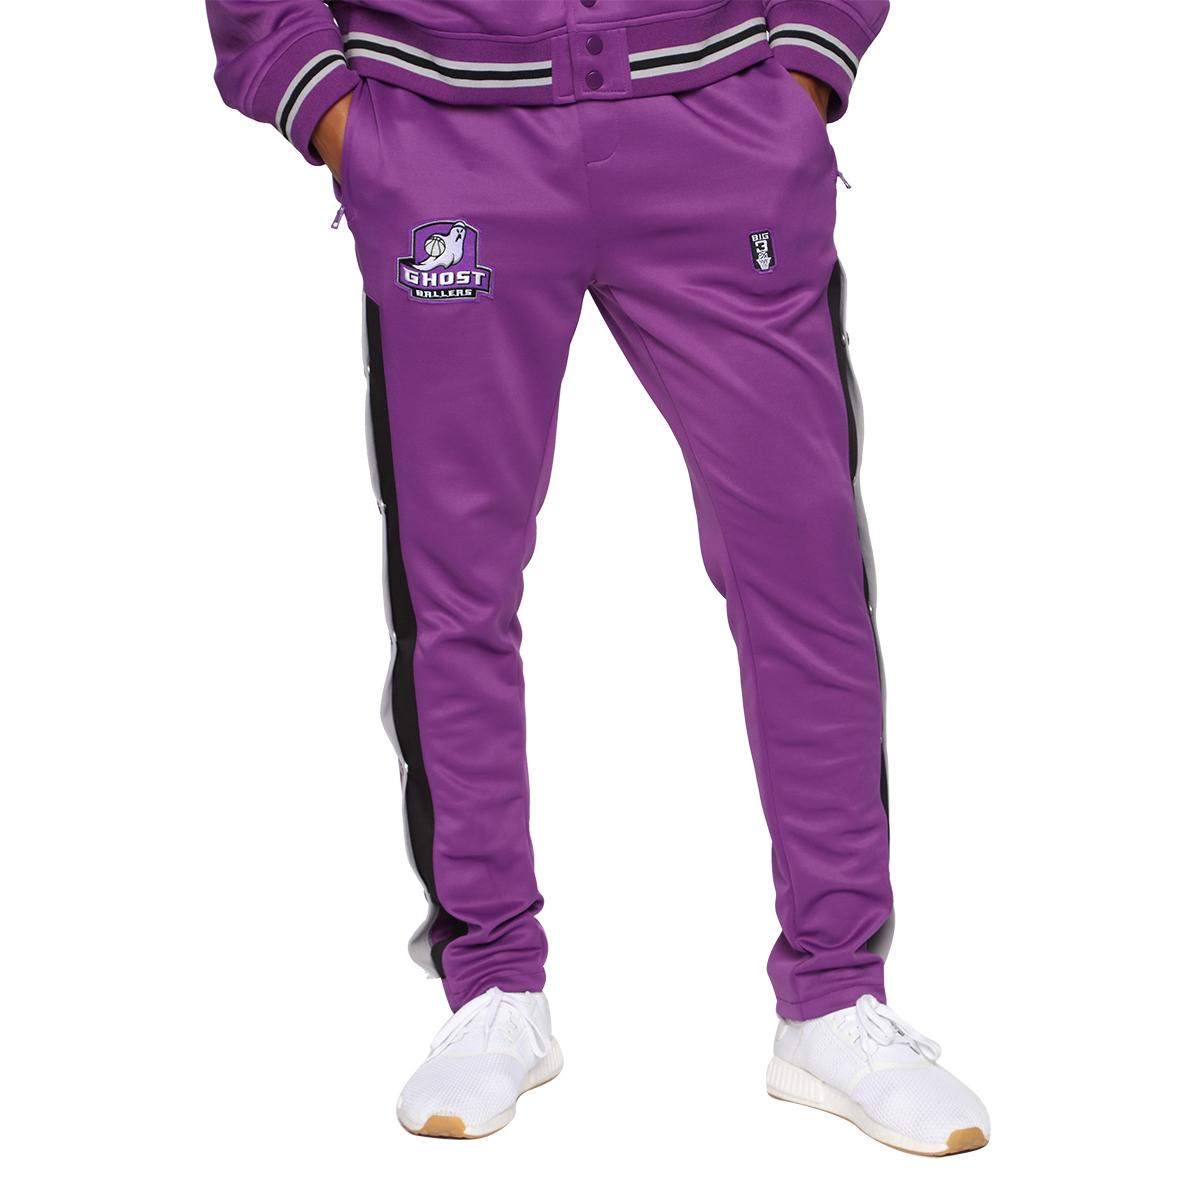 Team Ghost Ballers Joggers - Purple